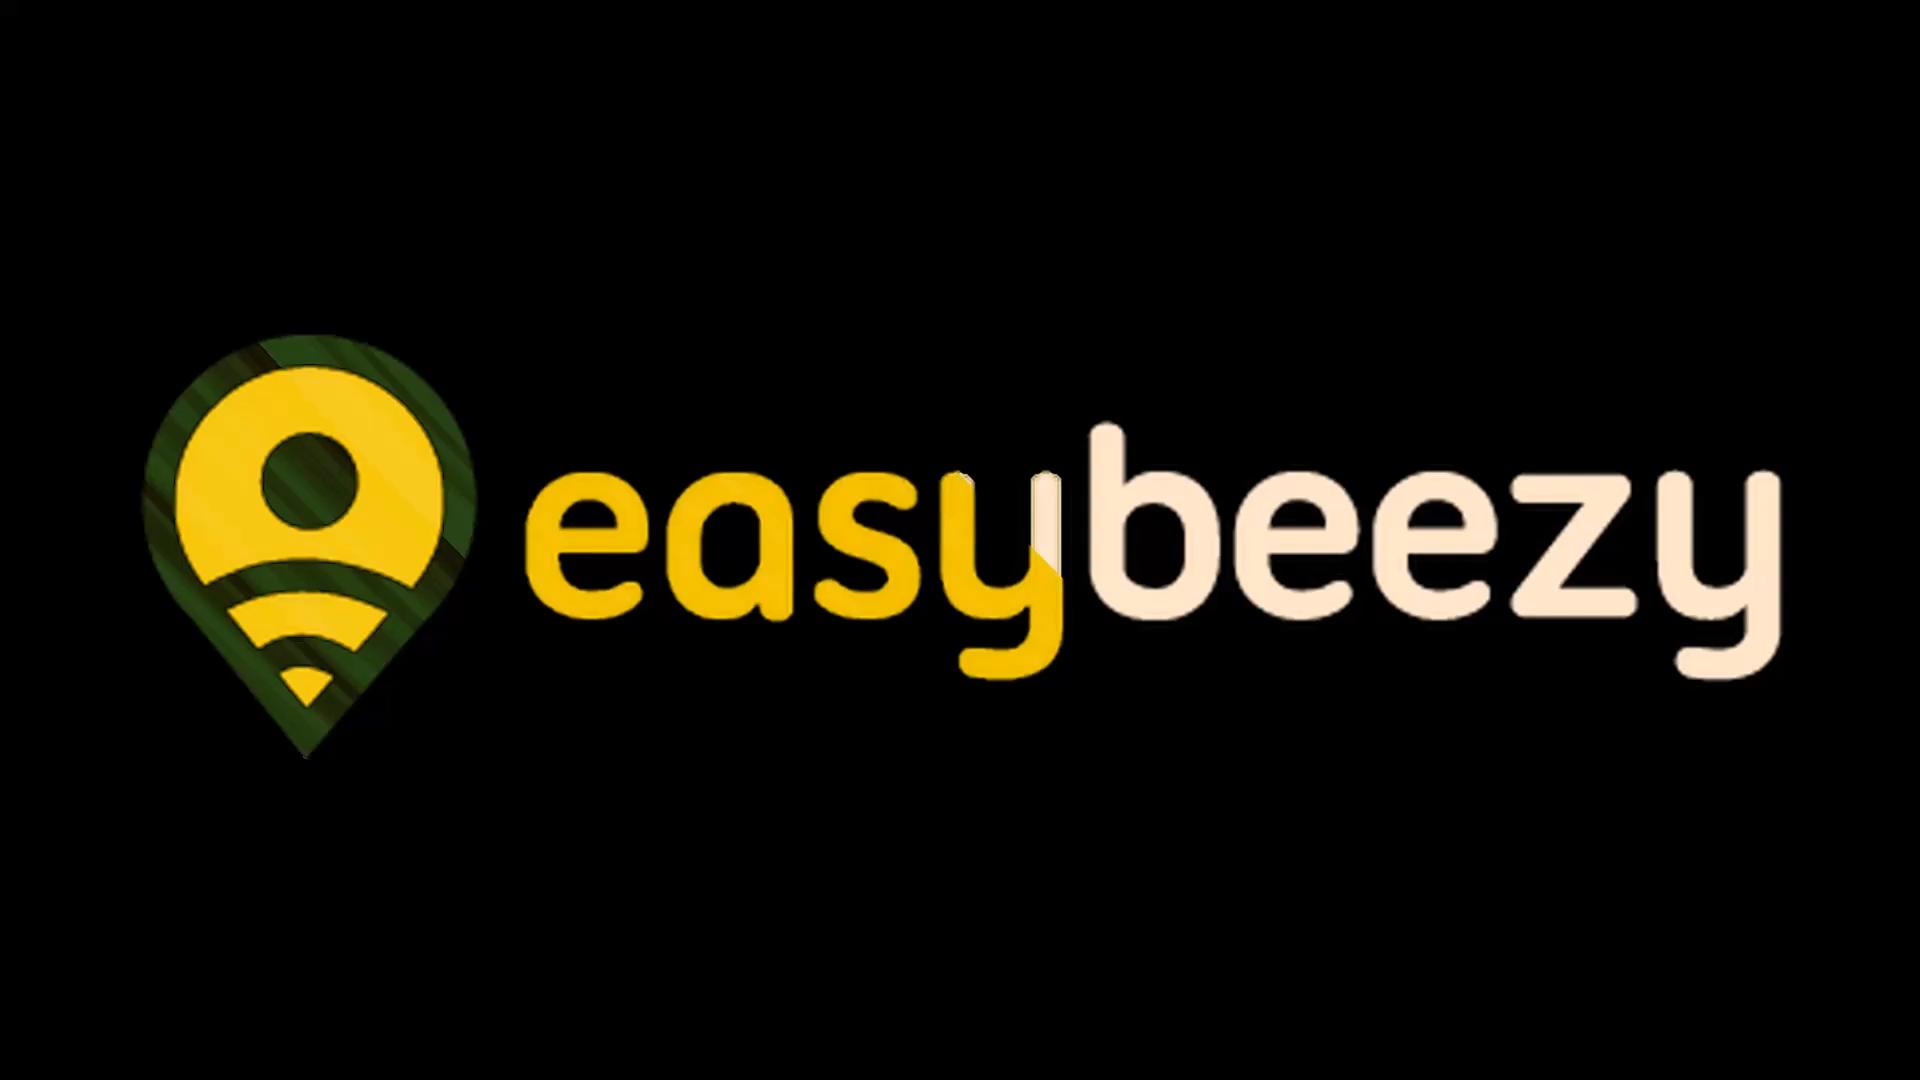 EasyBeezy Mobile App Promo 4.16 Final